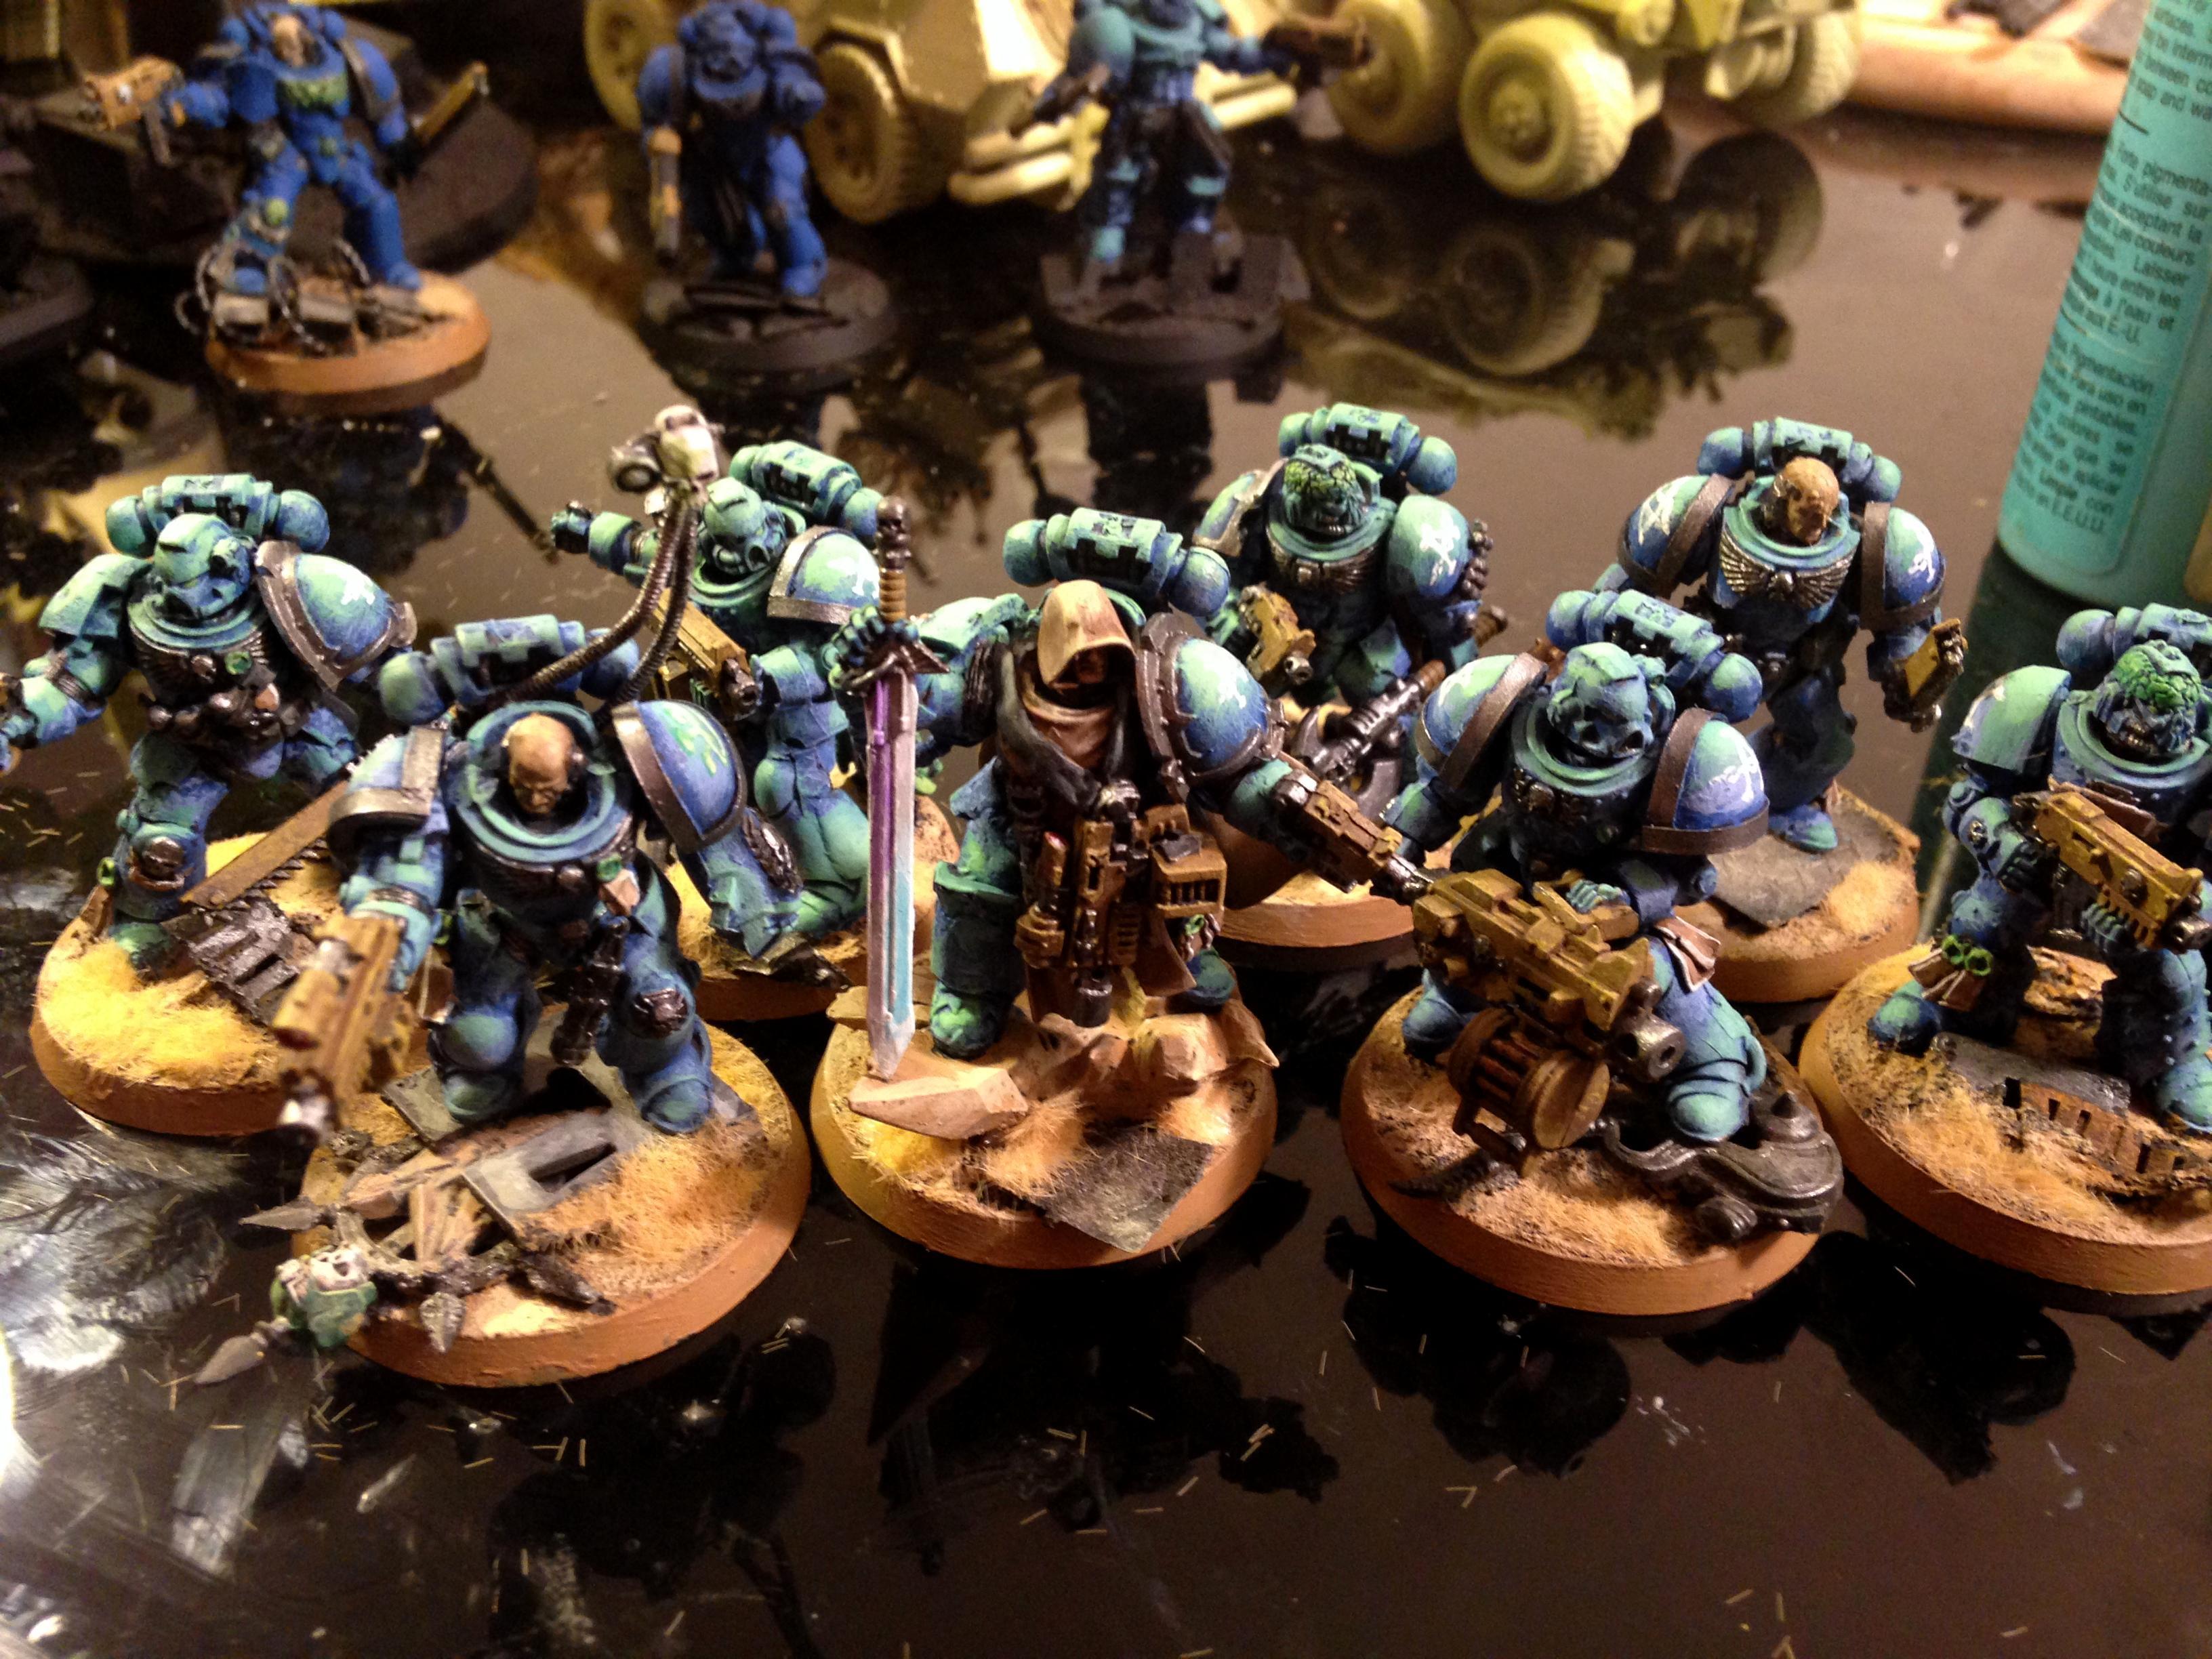 Alpha Legion, Art Scale, Chaos, Conversion, Desert, Kit Bash, Source Lighting, Space Marines, True Scale, Warhammer 40,000, Wet Blending